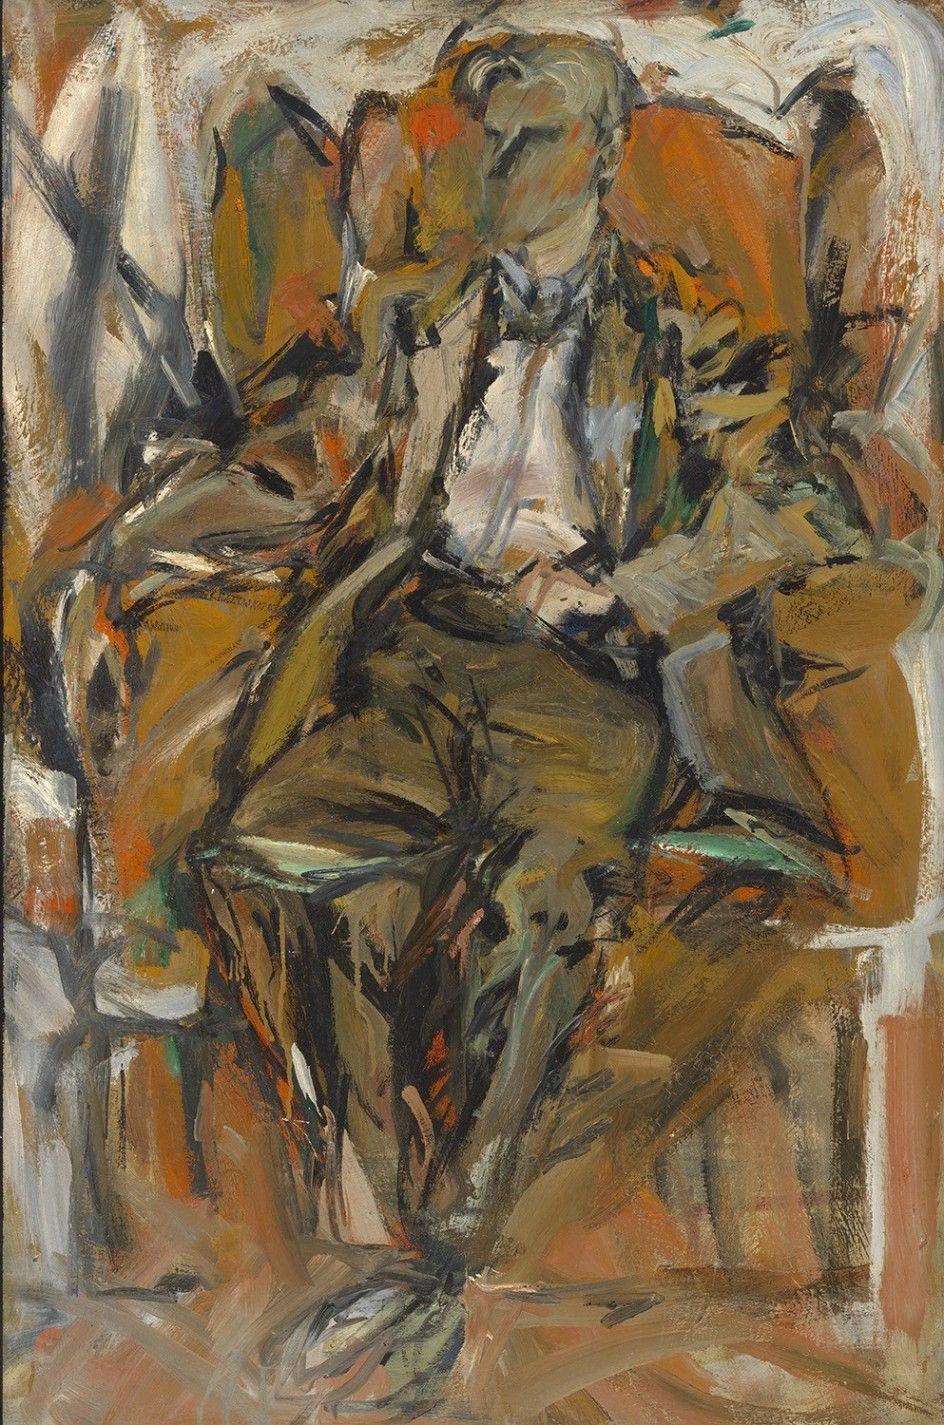 Elaine de Kooning  Willem de Kooning 1952 Oil on panel